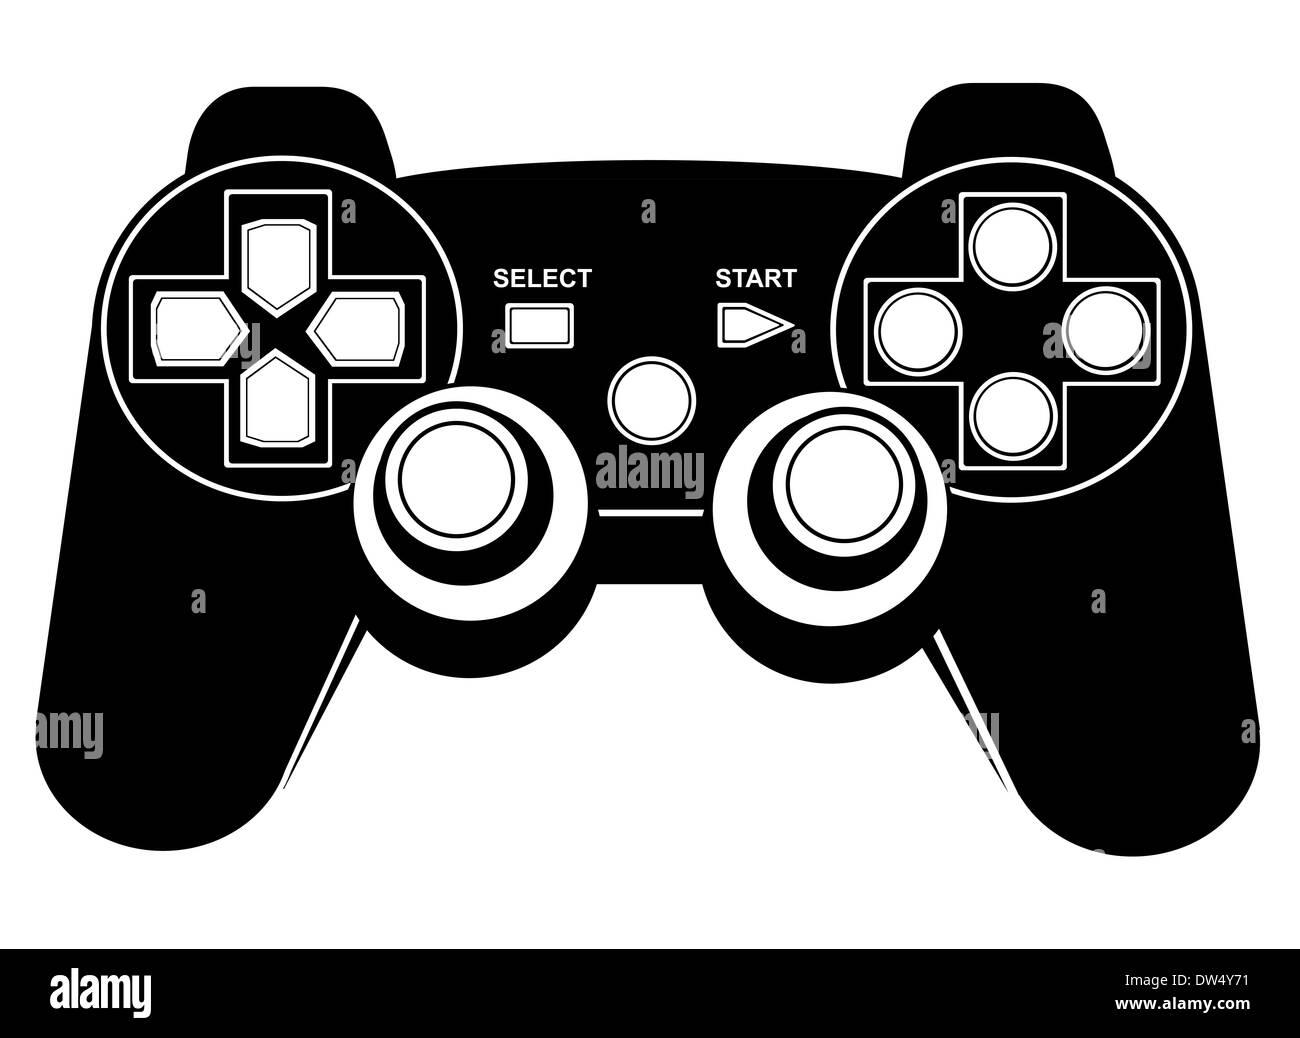 Game pad - Stock Image